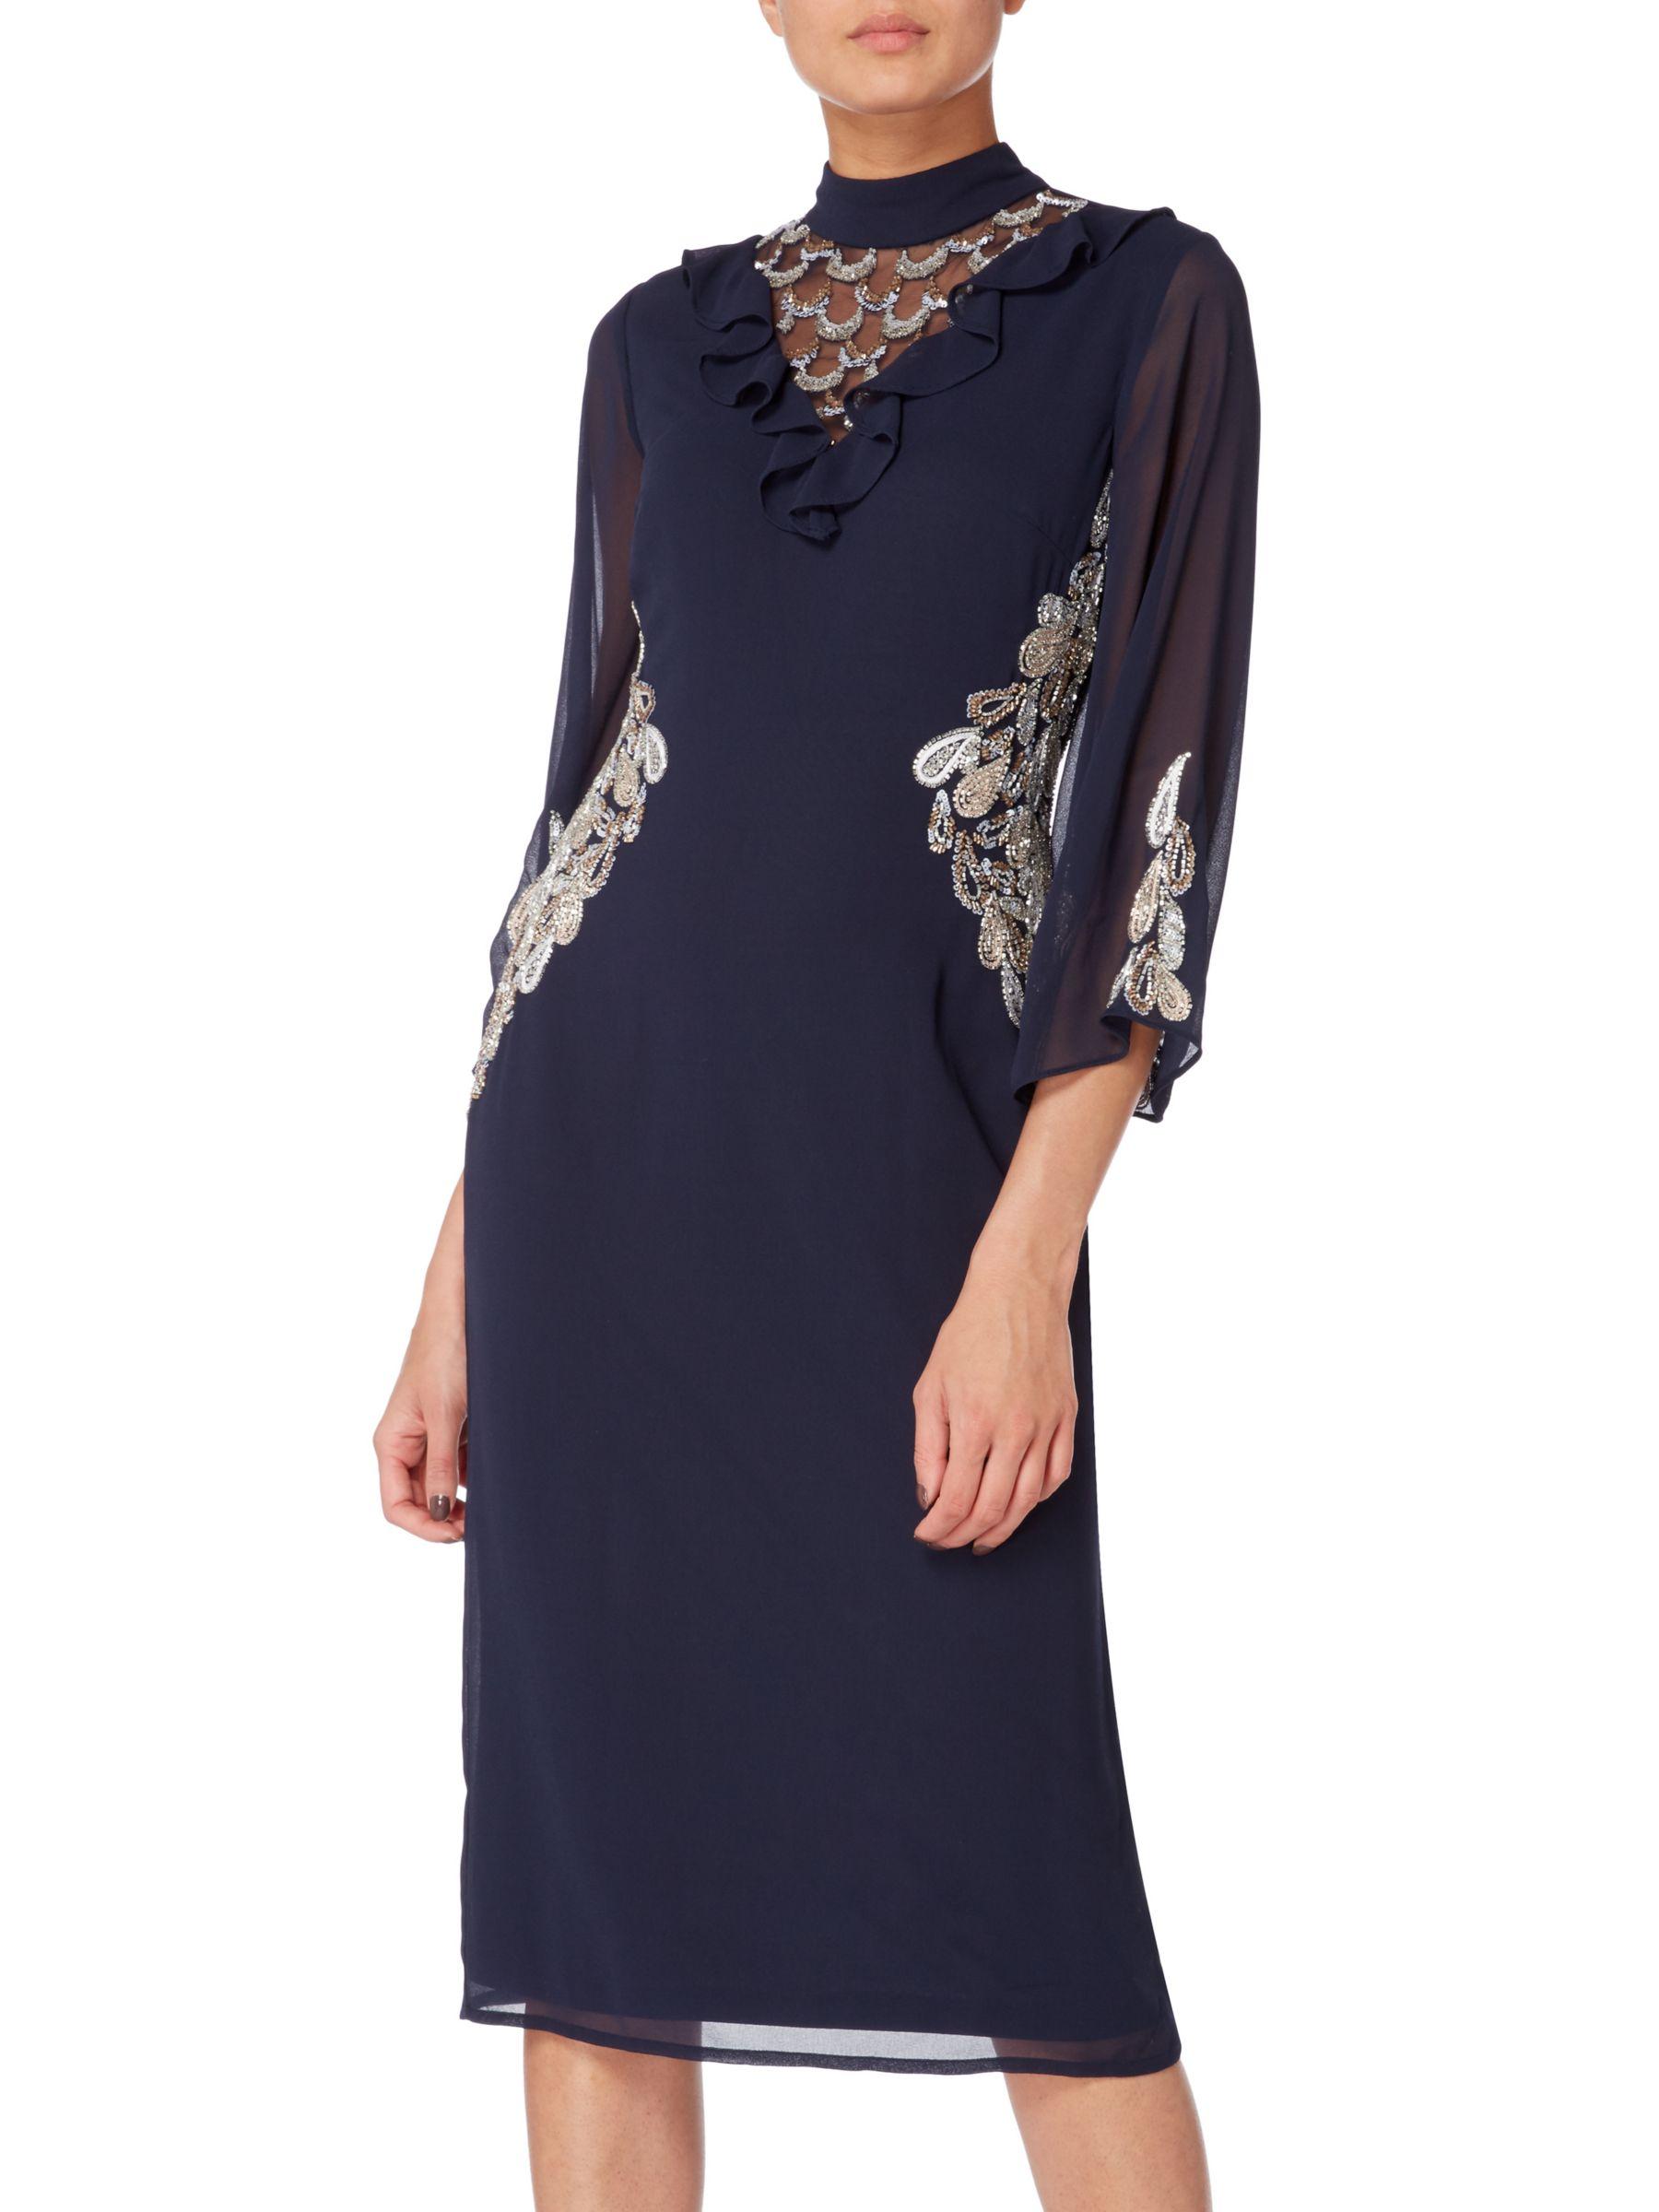 RAISHMA Raishma Embellished Frill Cocktail Dress